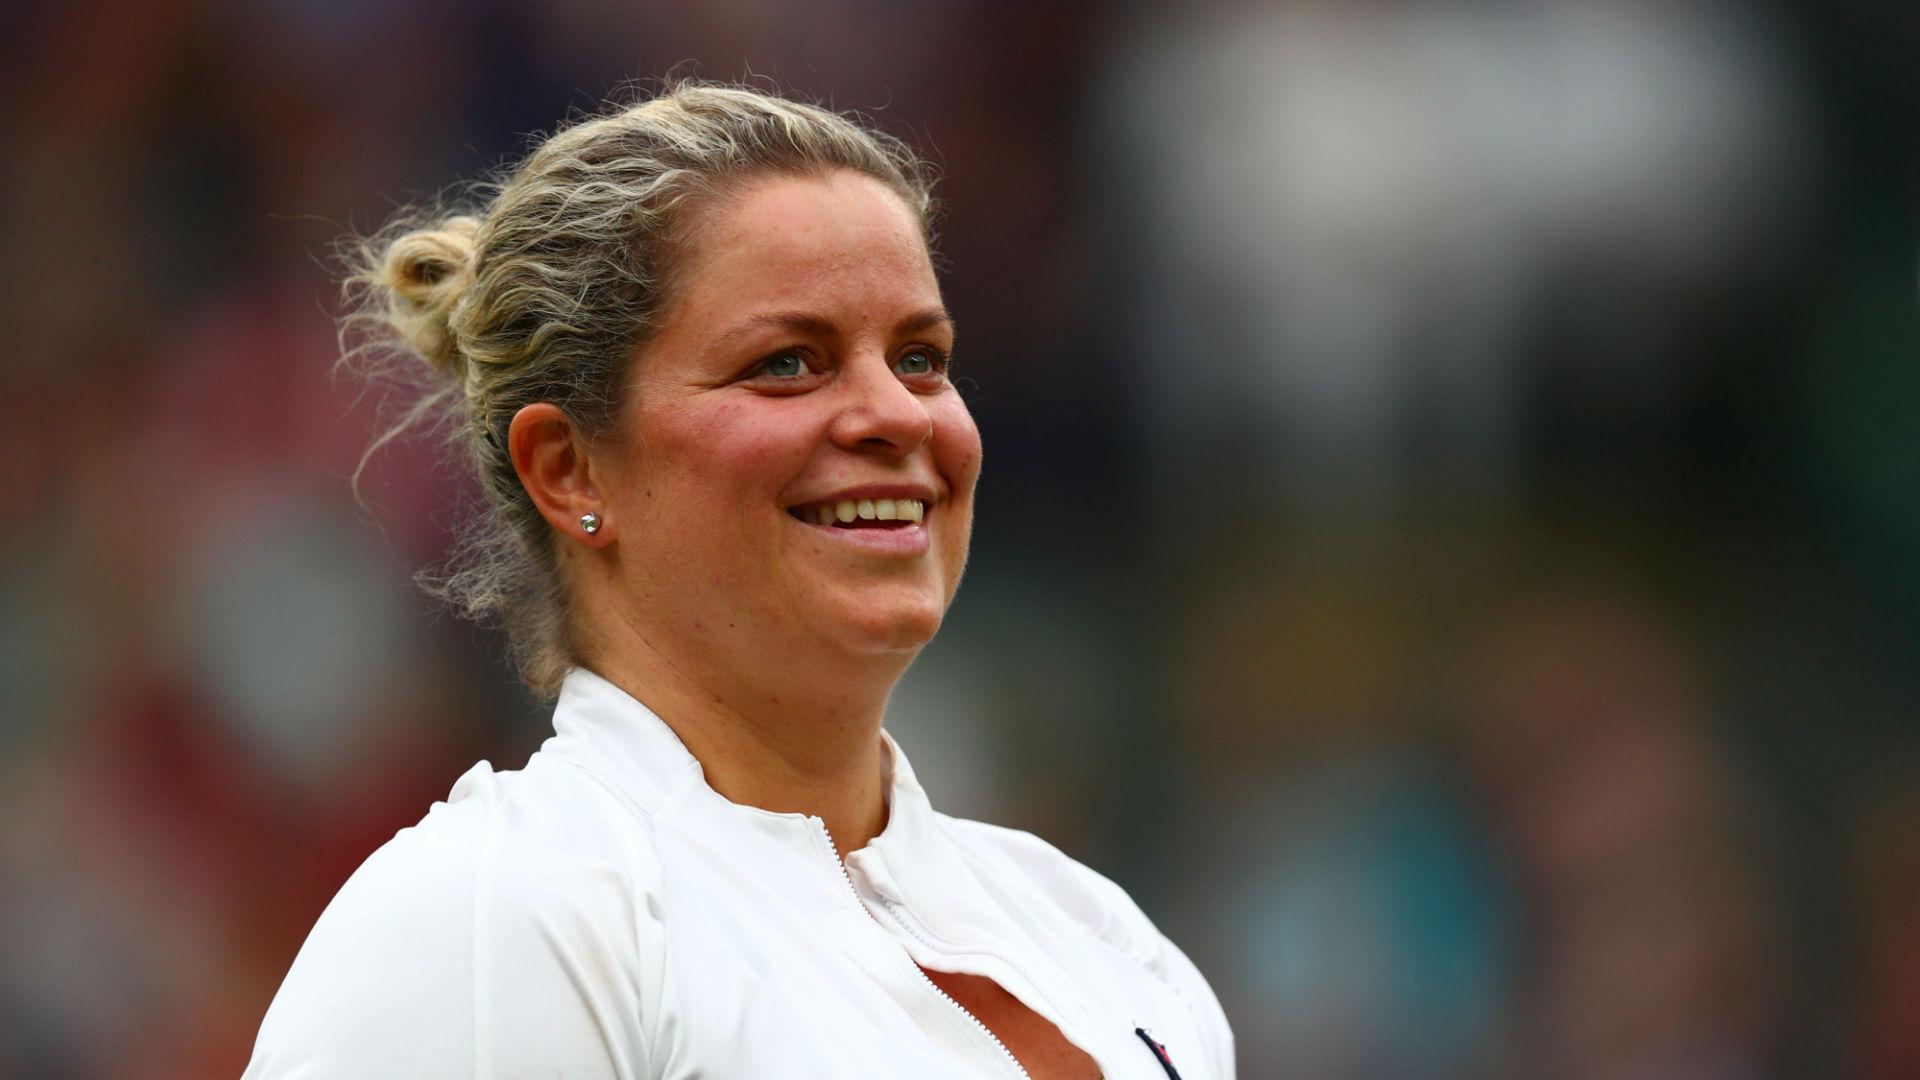 Former world No. 1 Kim Clijsters planning shocking WTA Tour comeback